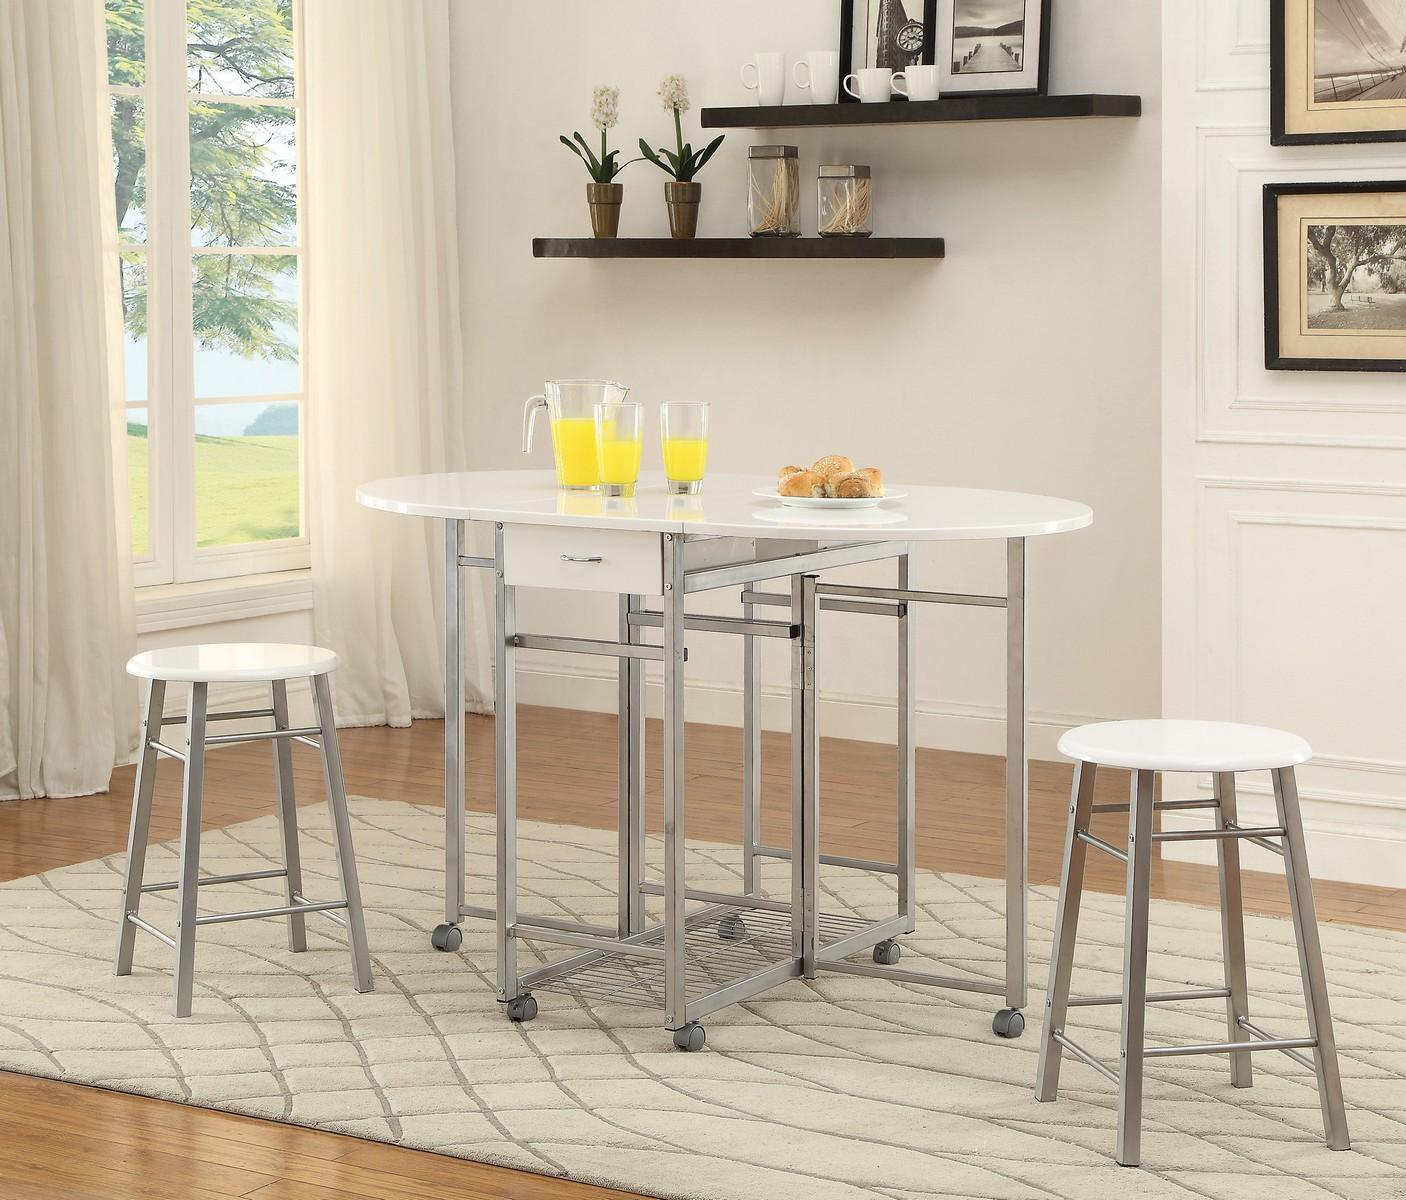 Coaster 100080 3-Piece Dining Set - White/Chrome